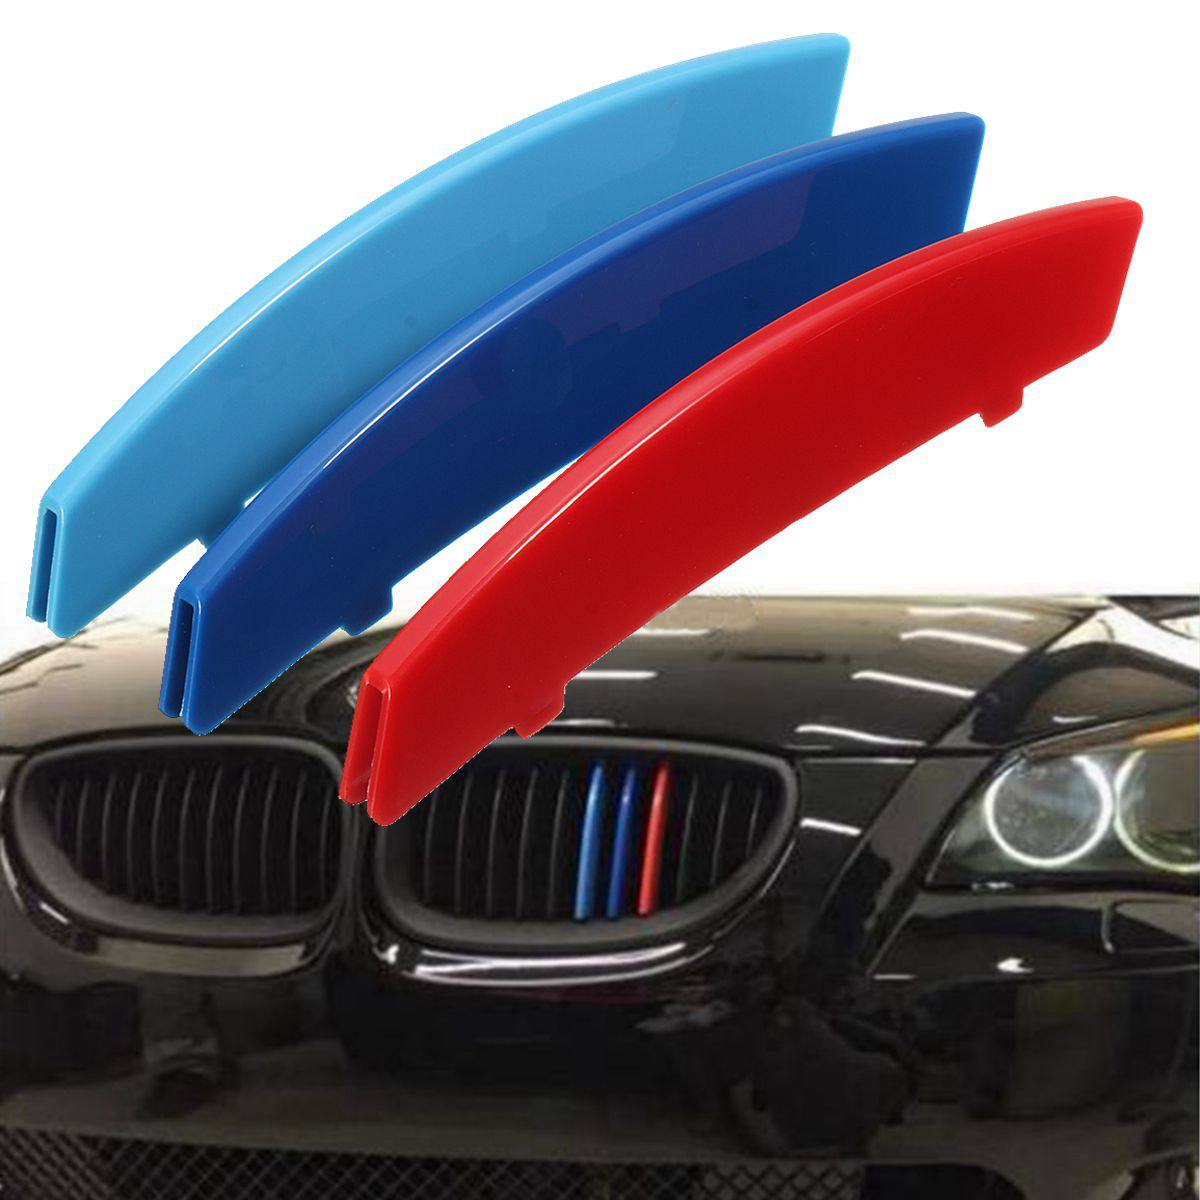 3 adet 3D araba yarışı ızgara spor şerit klip ABS çıkartma BMW 3 serisi için F30 F31 F35 E90 5 serisi F10 F18 E60 X5 X6 E70